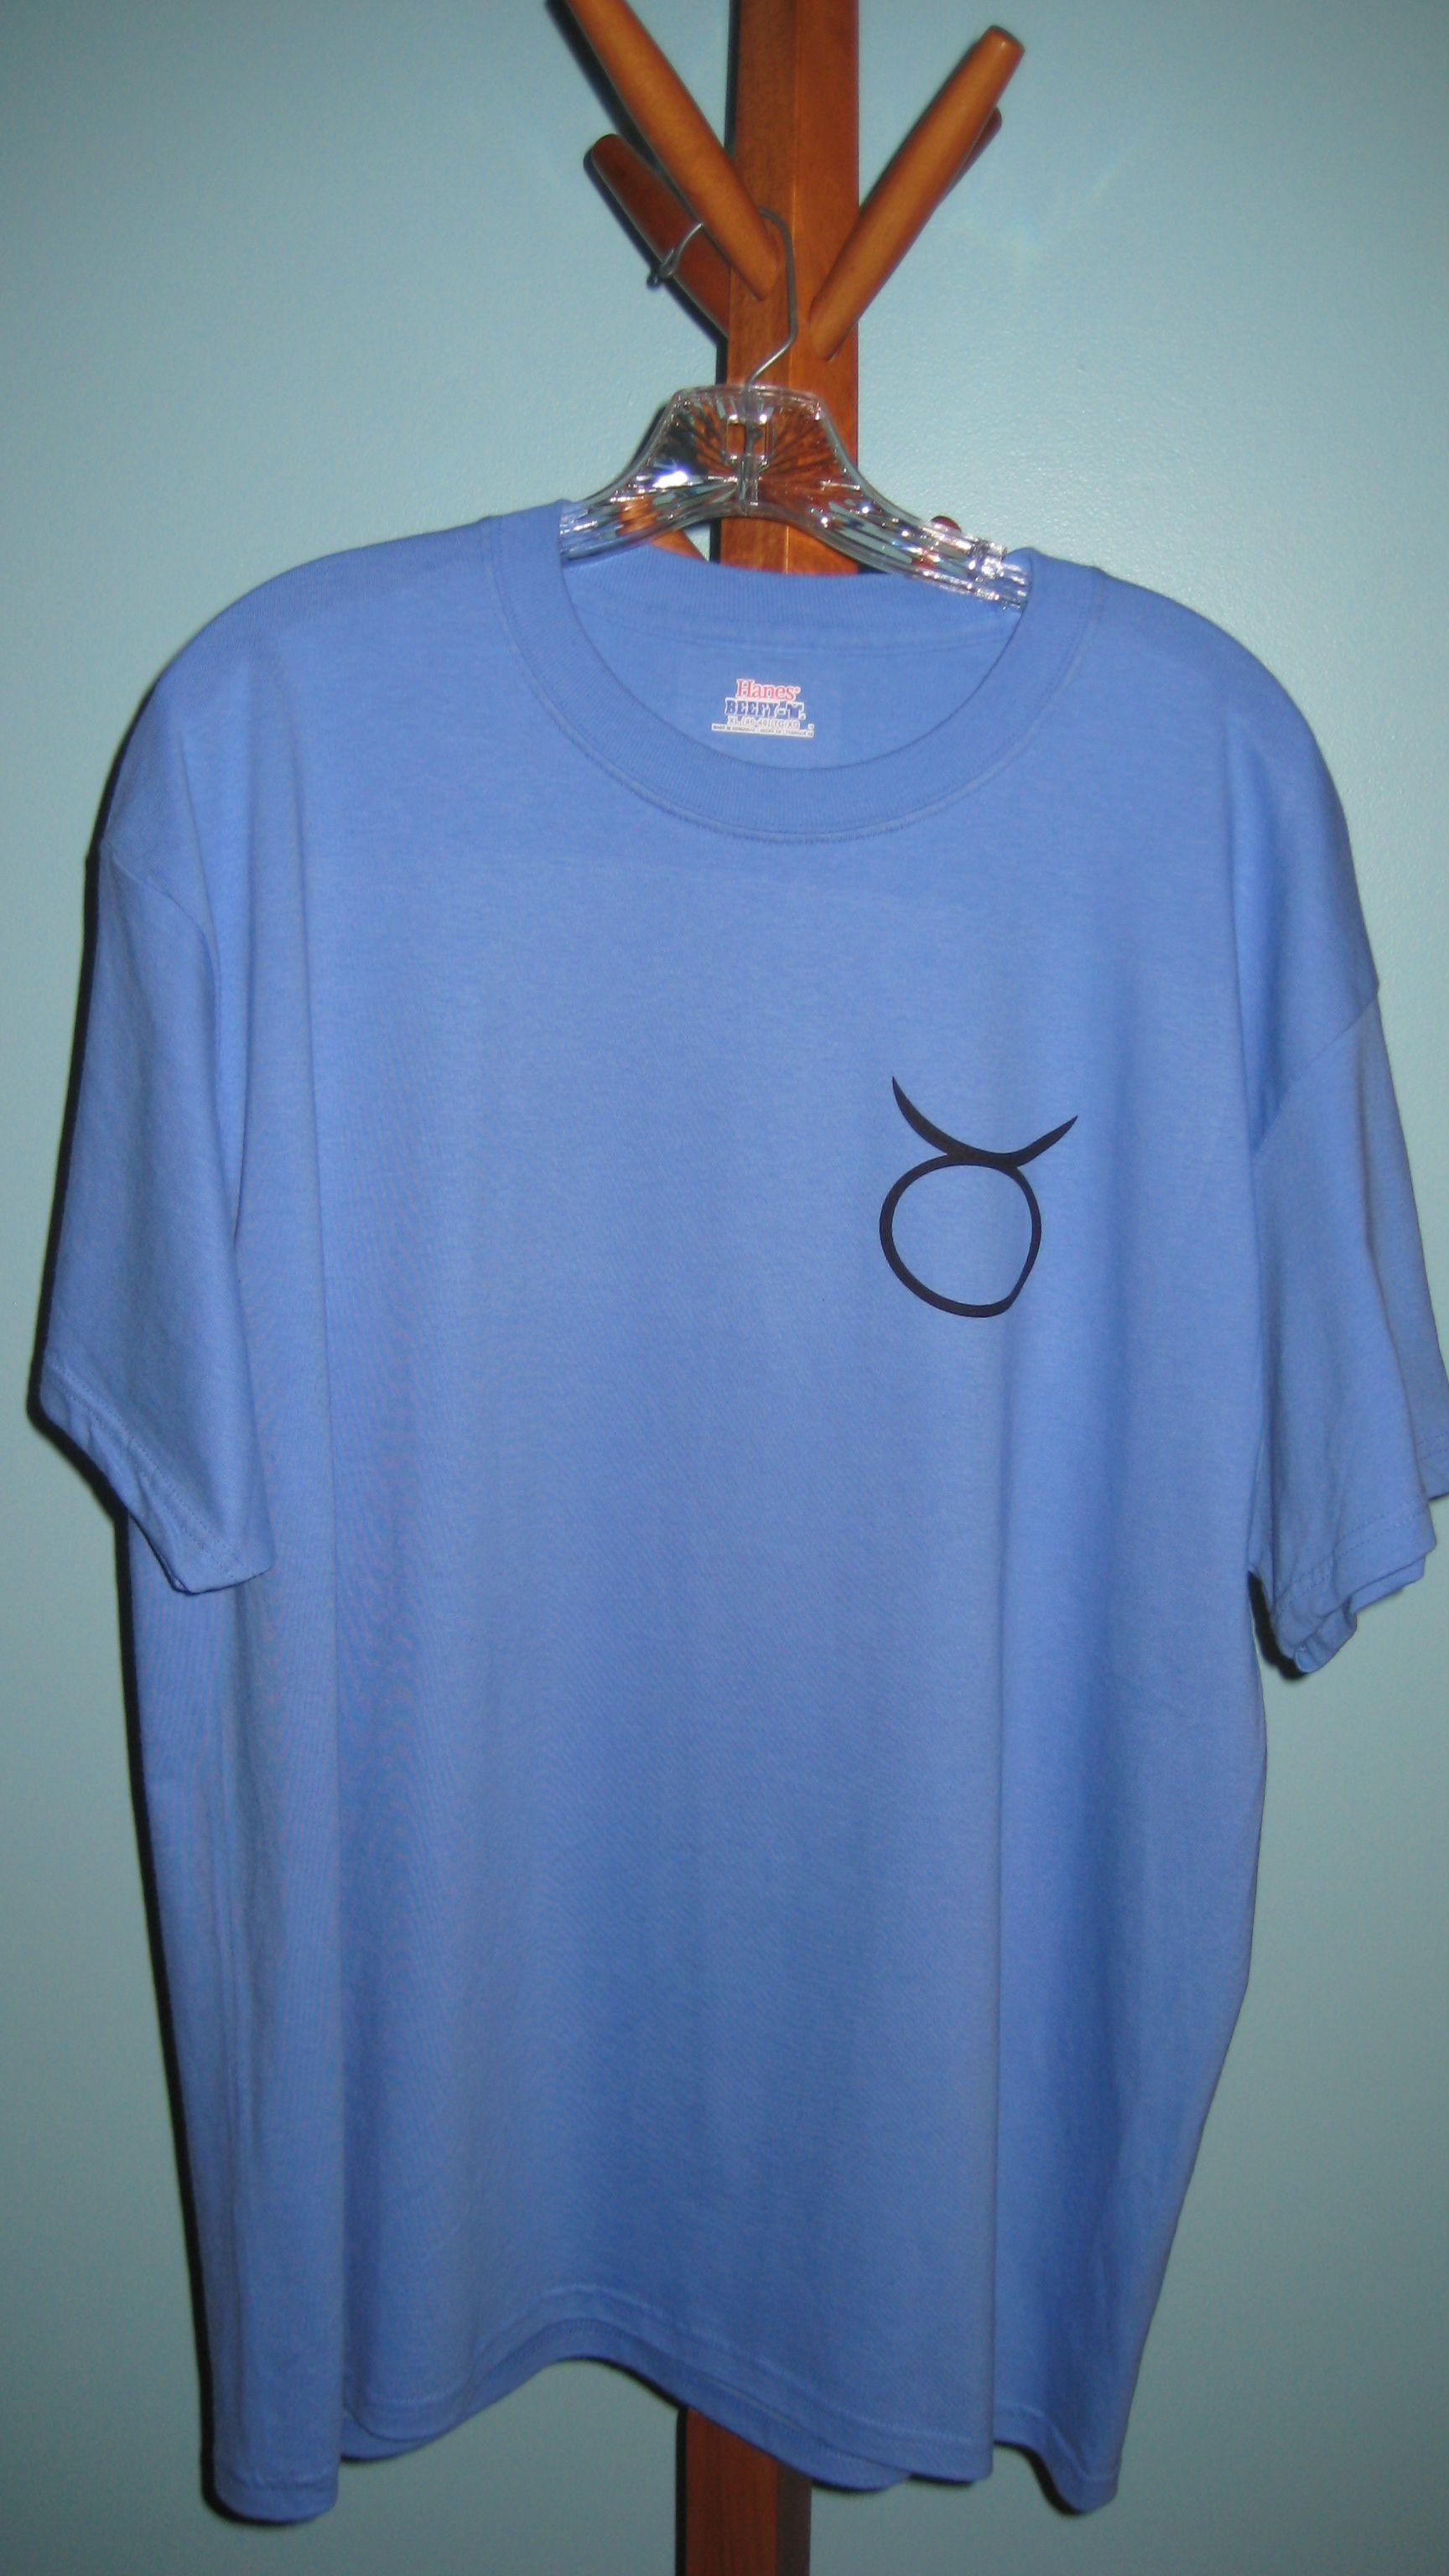 Taurus Crossword T-shirt (Front)